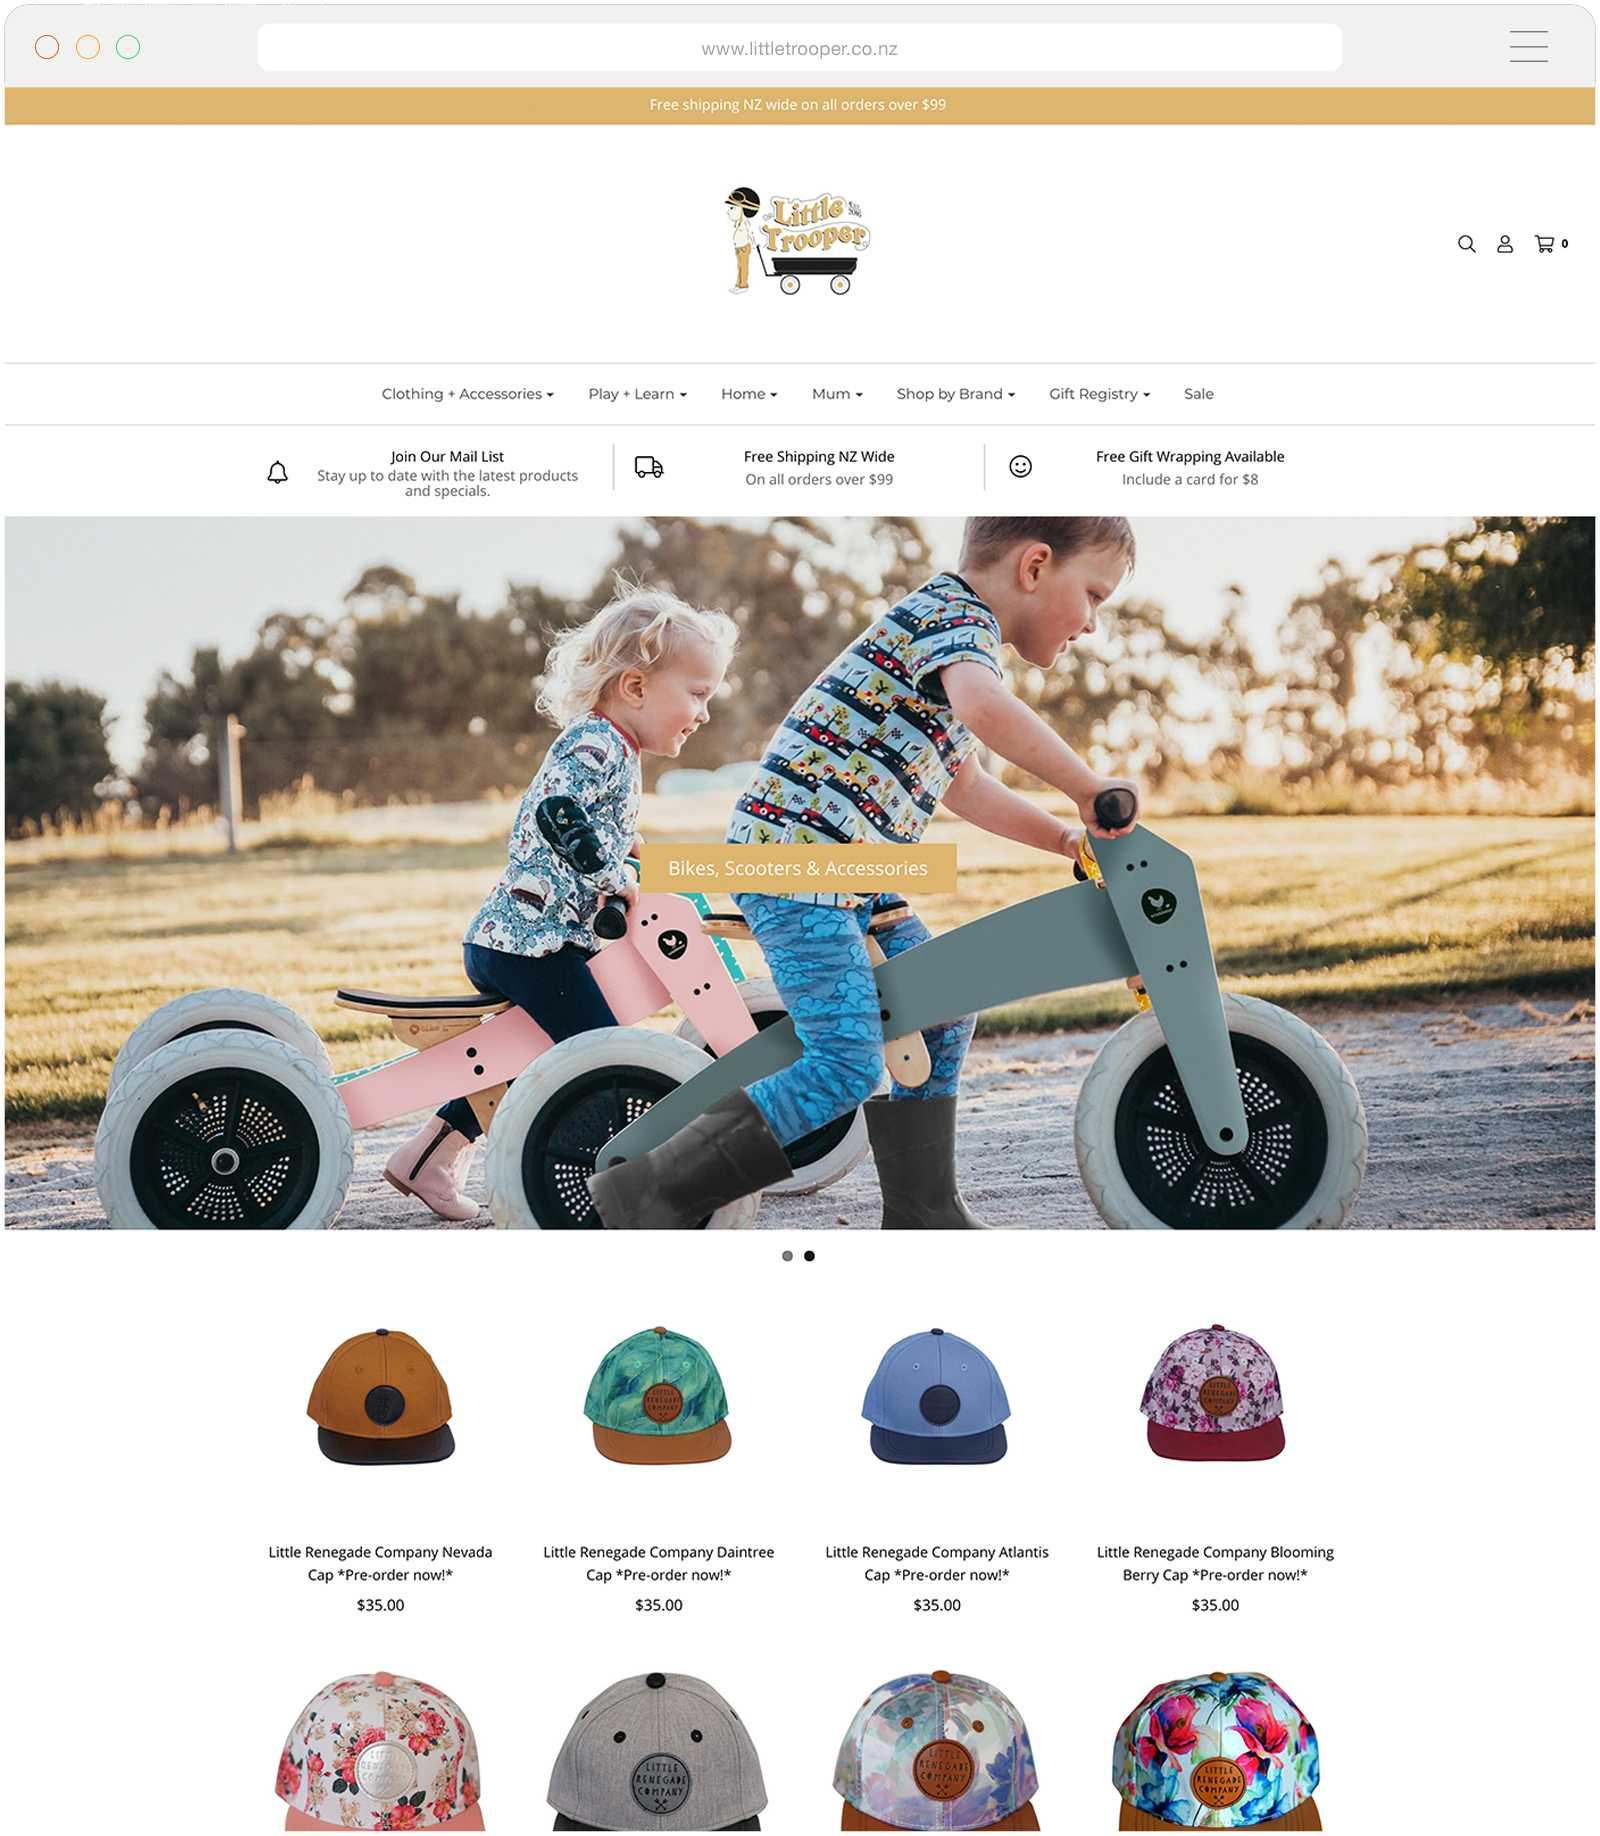 Shopify Websites Tauranga - Little Trooper